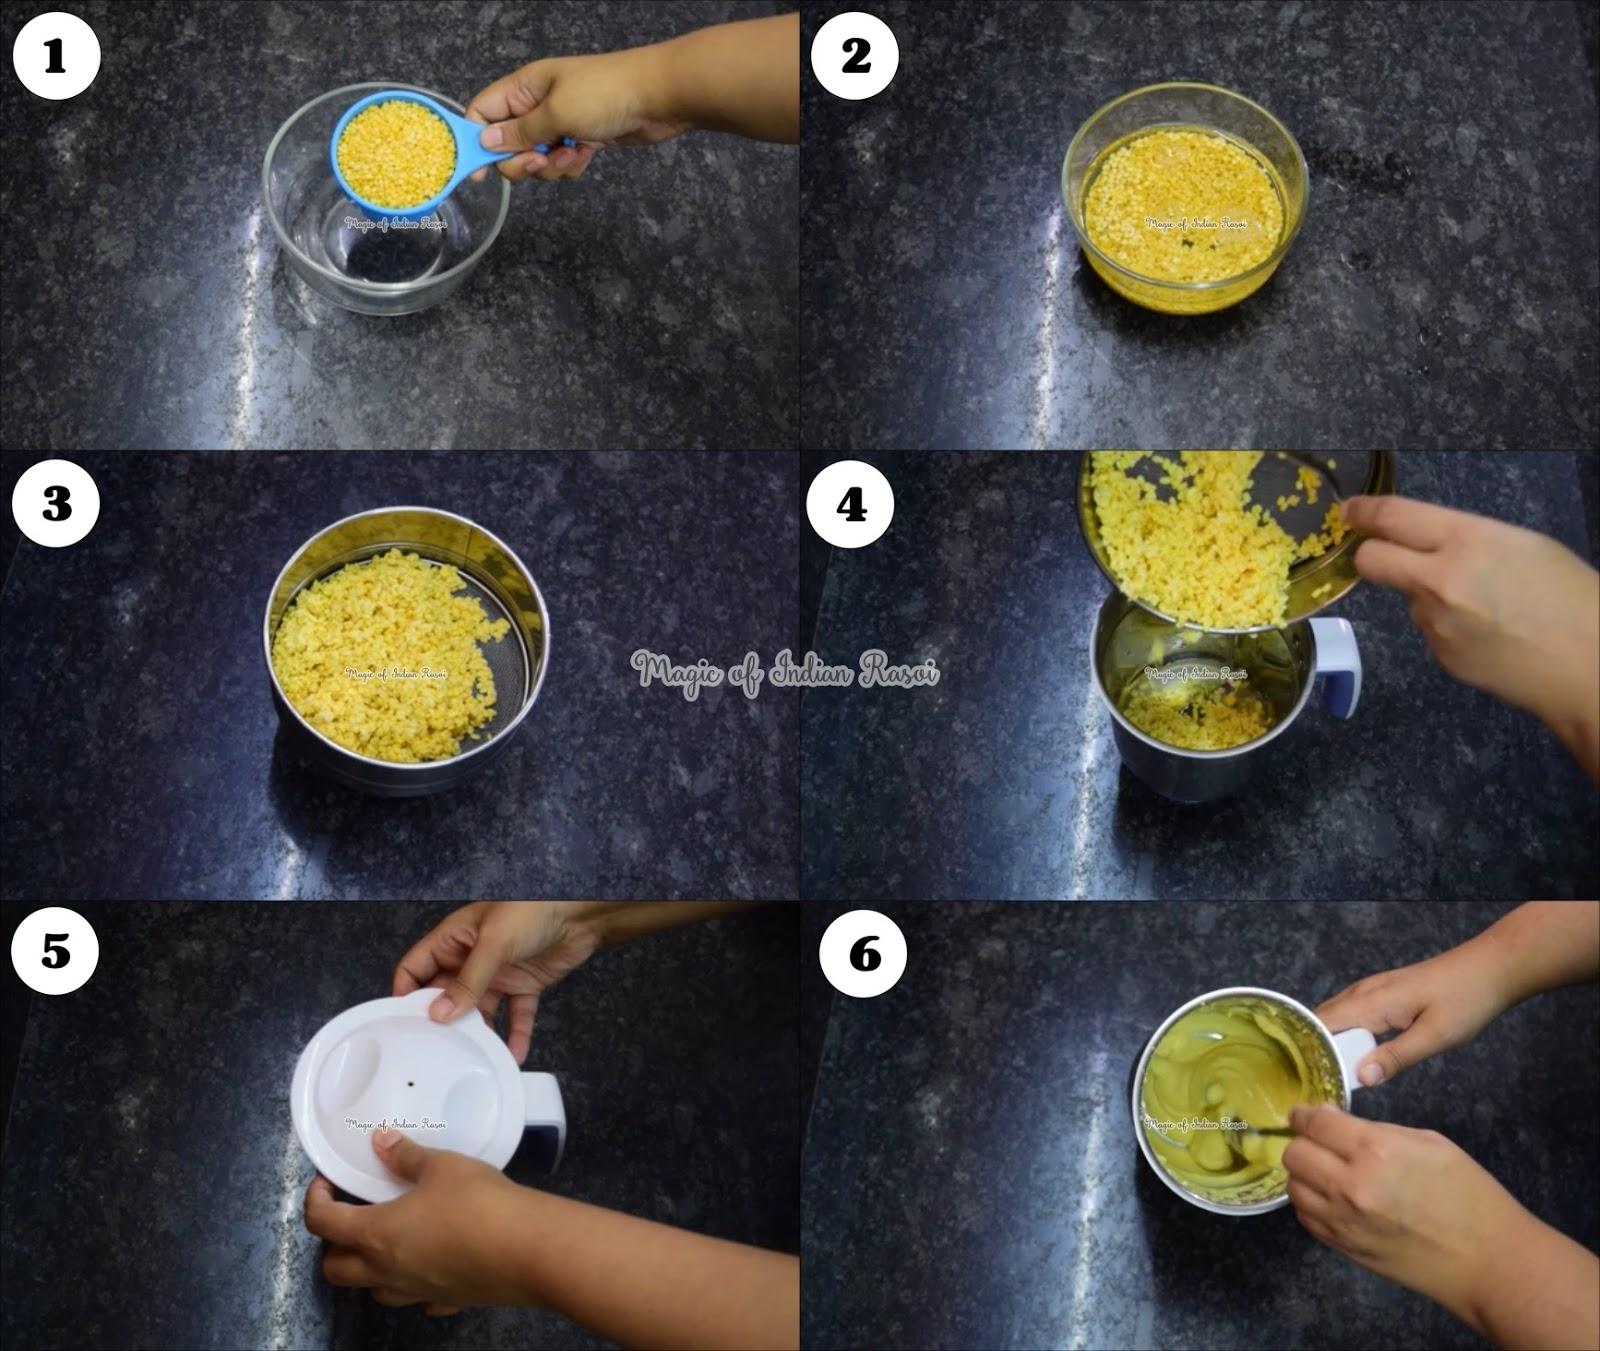 Methi & Moong Dal Vada - Methi Mung Dal Bhajiya Recipe - मेथी और मूँग दाल वडा - मेथी मूंग दल भजीया रेसिपी - Priya R - Magic of Indian Rasoi